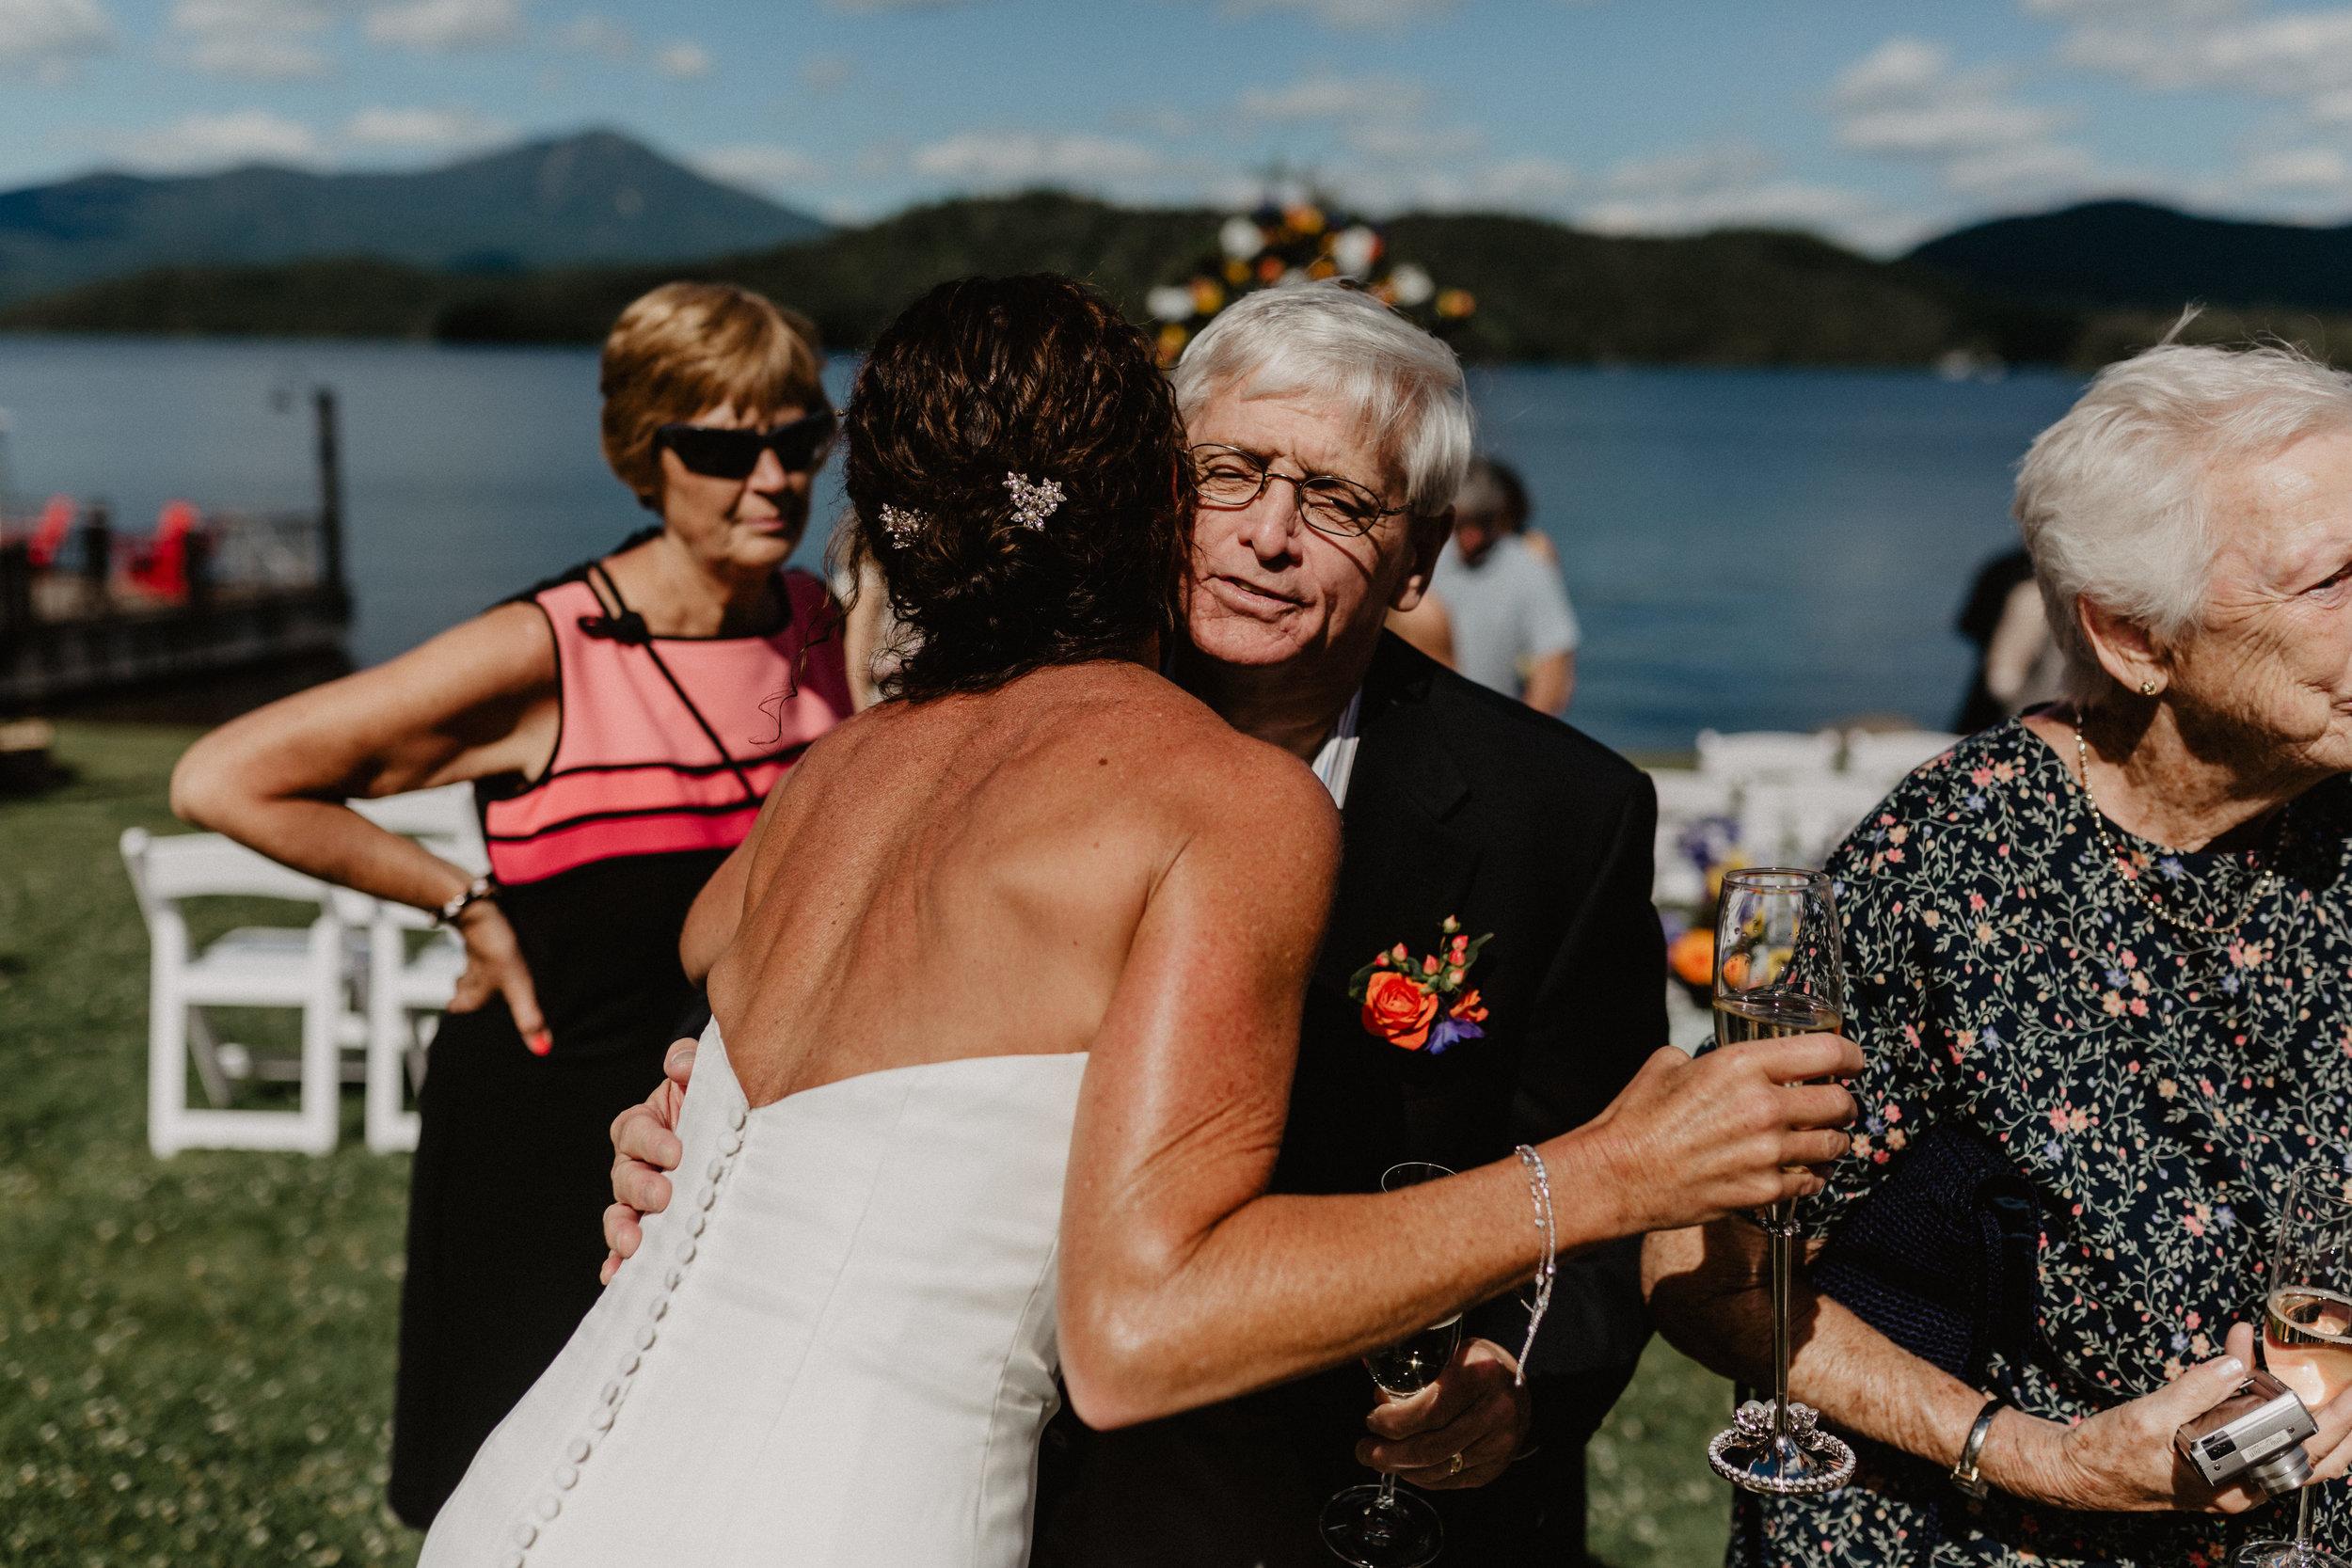 lake_placid_lodge_wedding_025.jpg